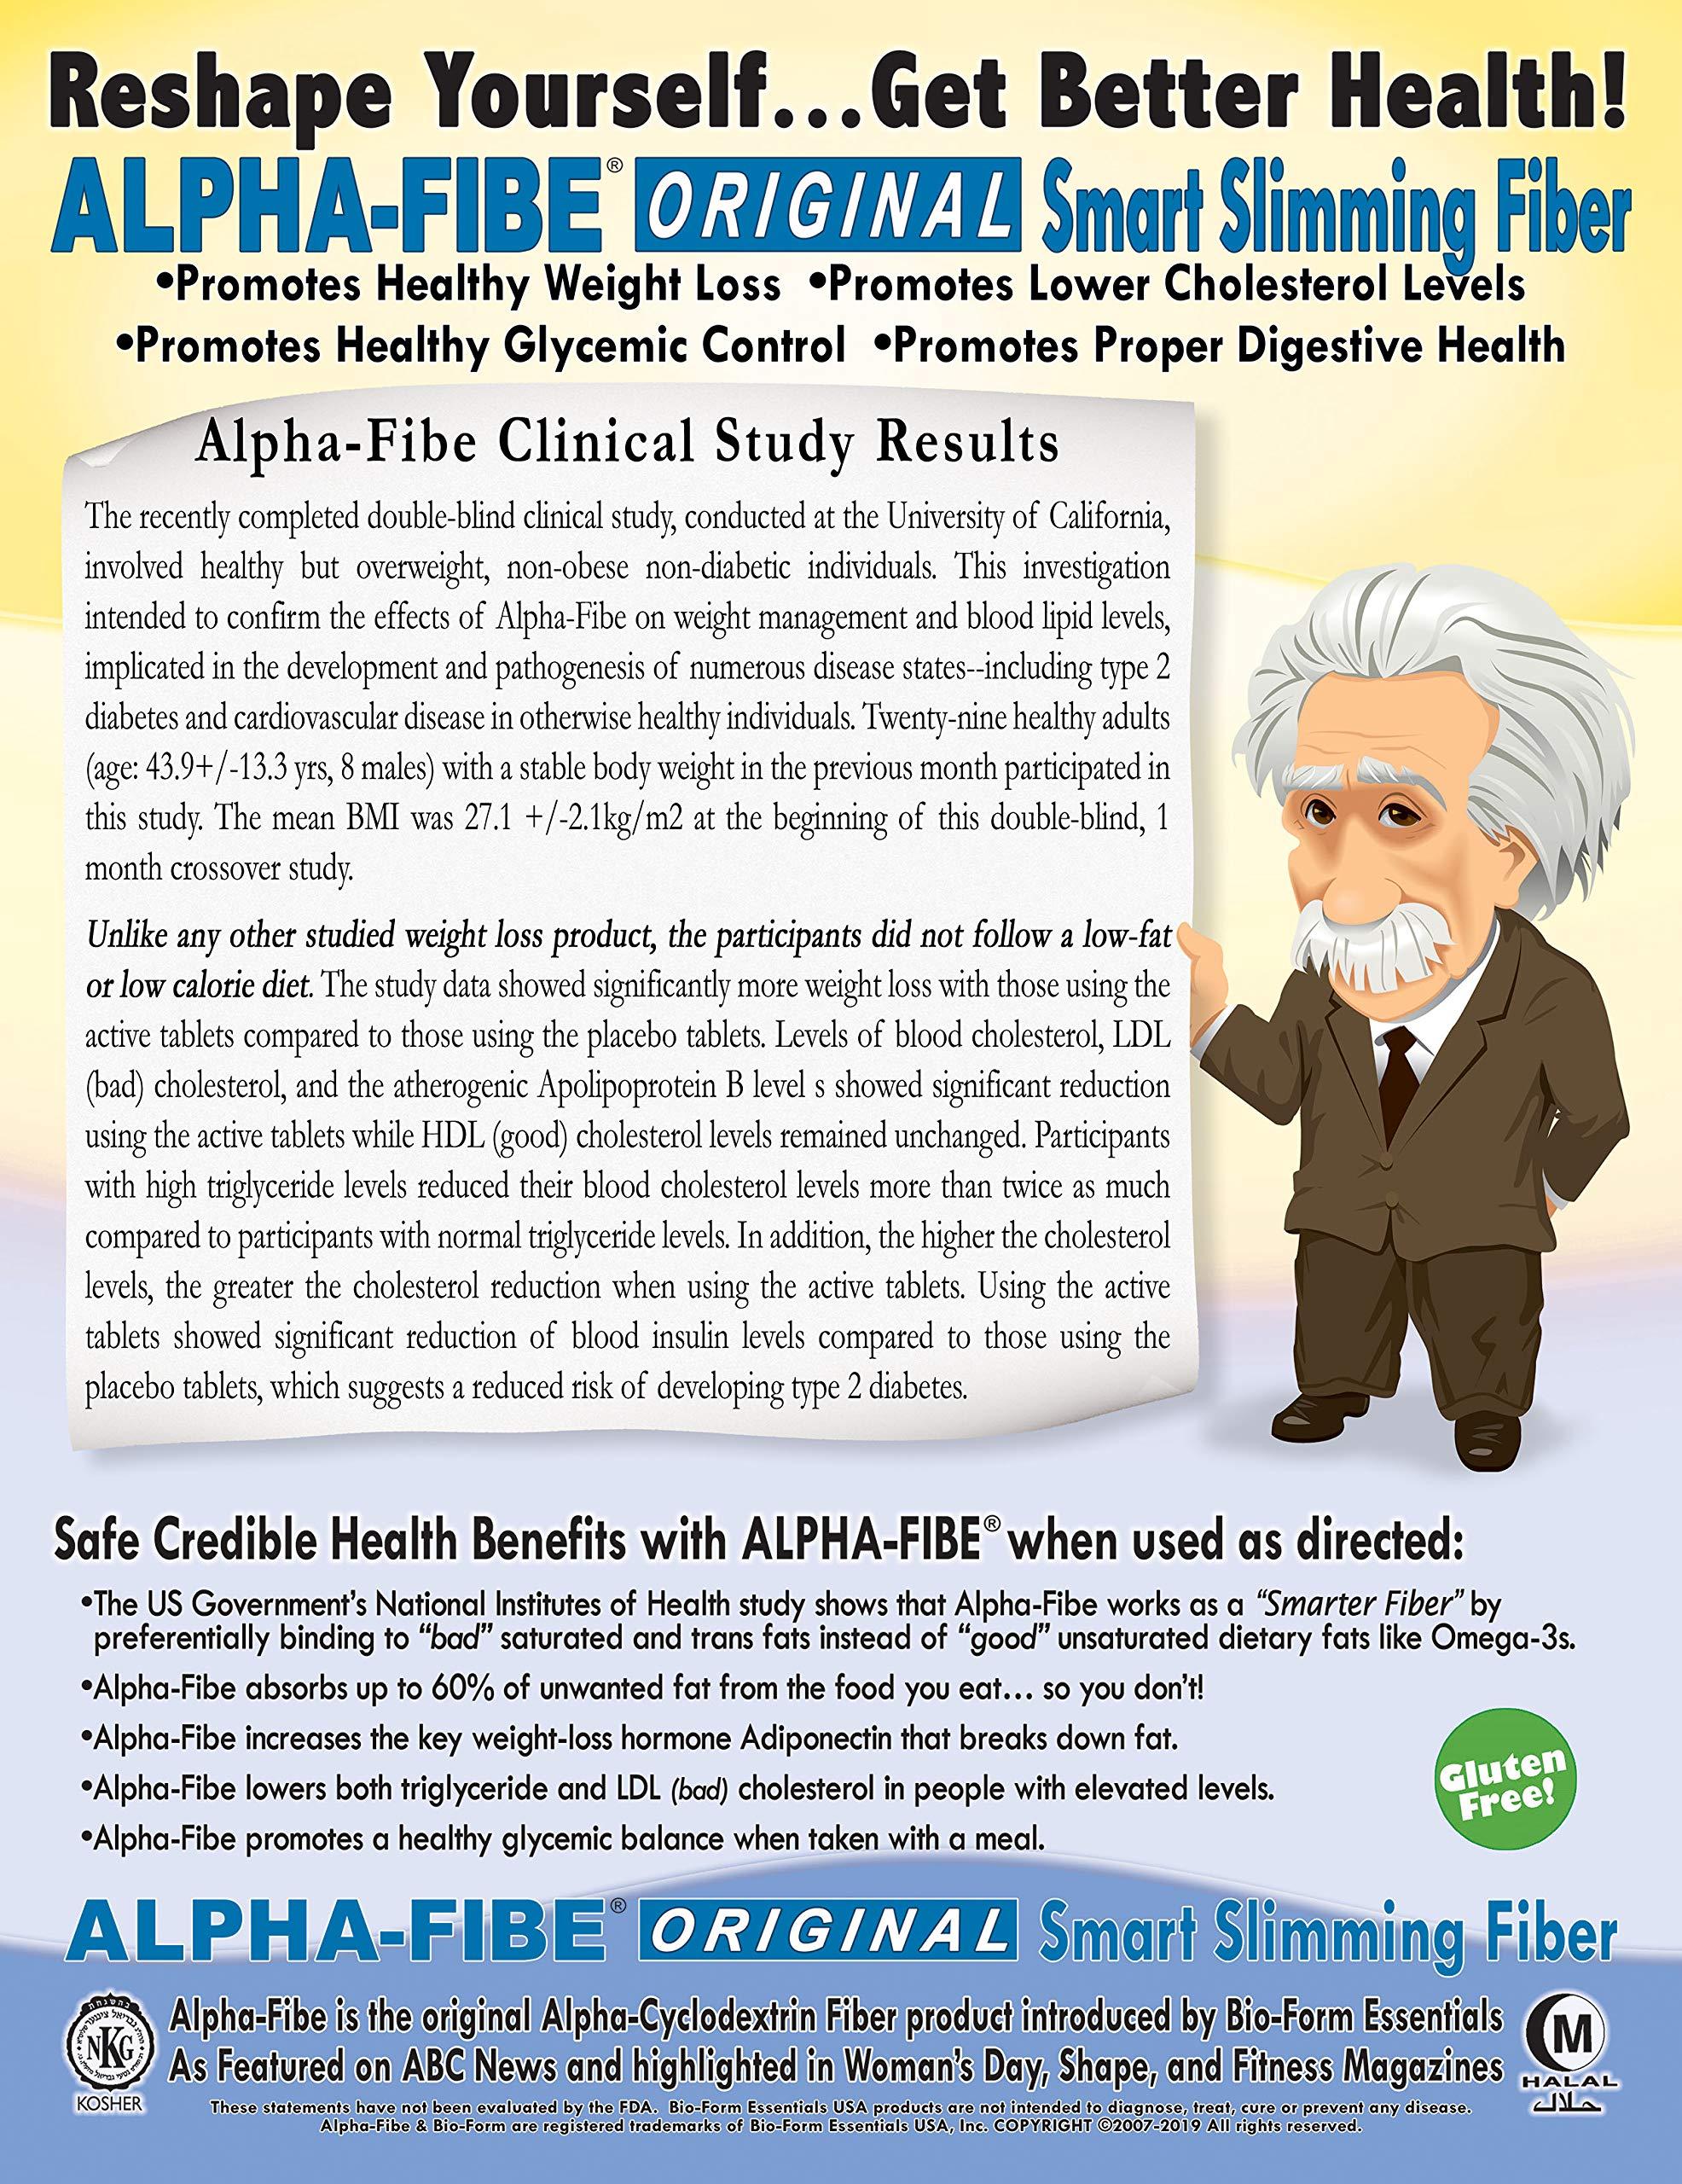 Alpha-Fibe Original Smart Weight Loss Slimming Fiber for Men & Women (180 Fast-Acting Capsules) by Bio-Form Essentials